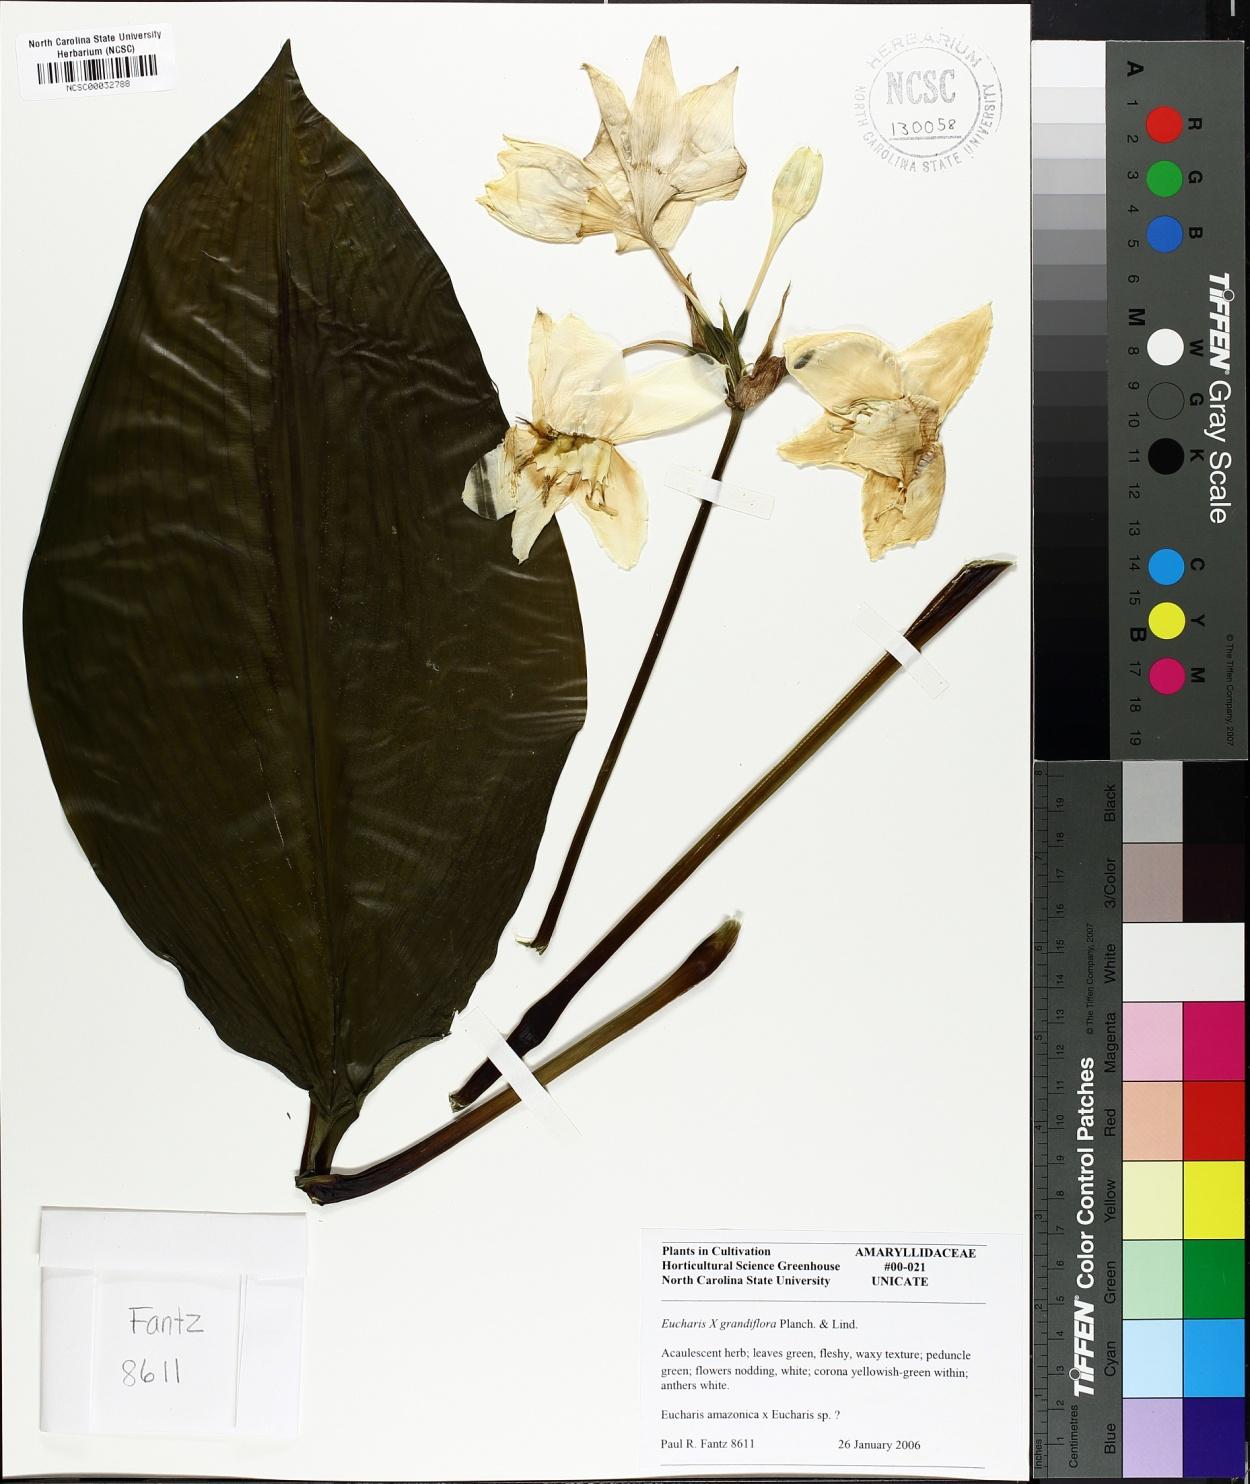 Eucharis x grandiflora image